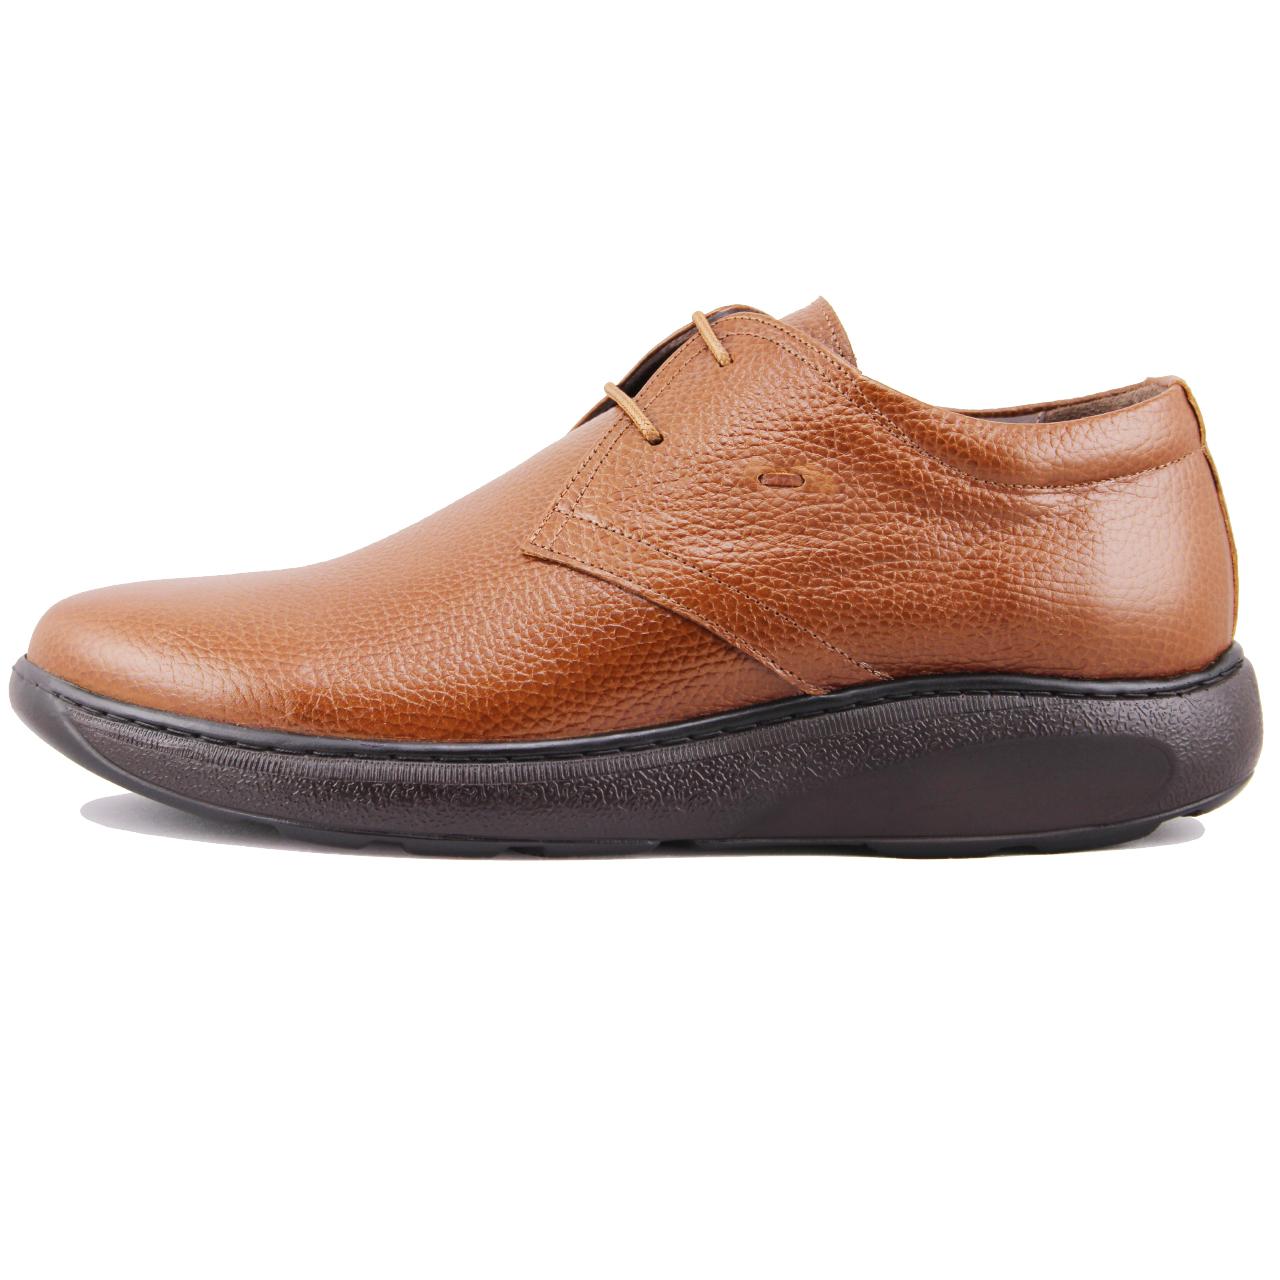 کفش مردانه چرم طبیعی ژاو مدل 2084